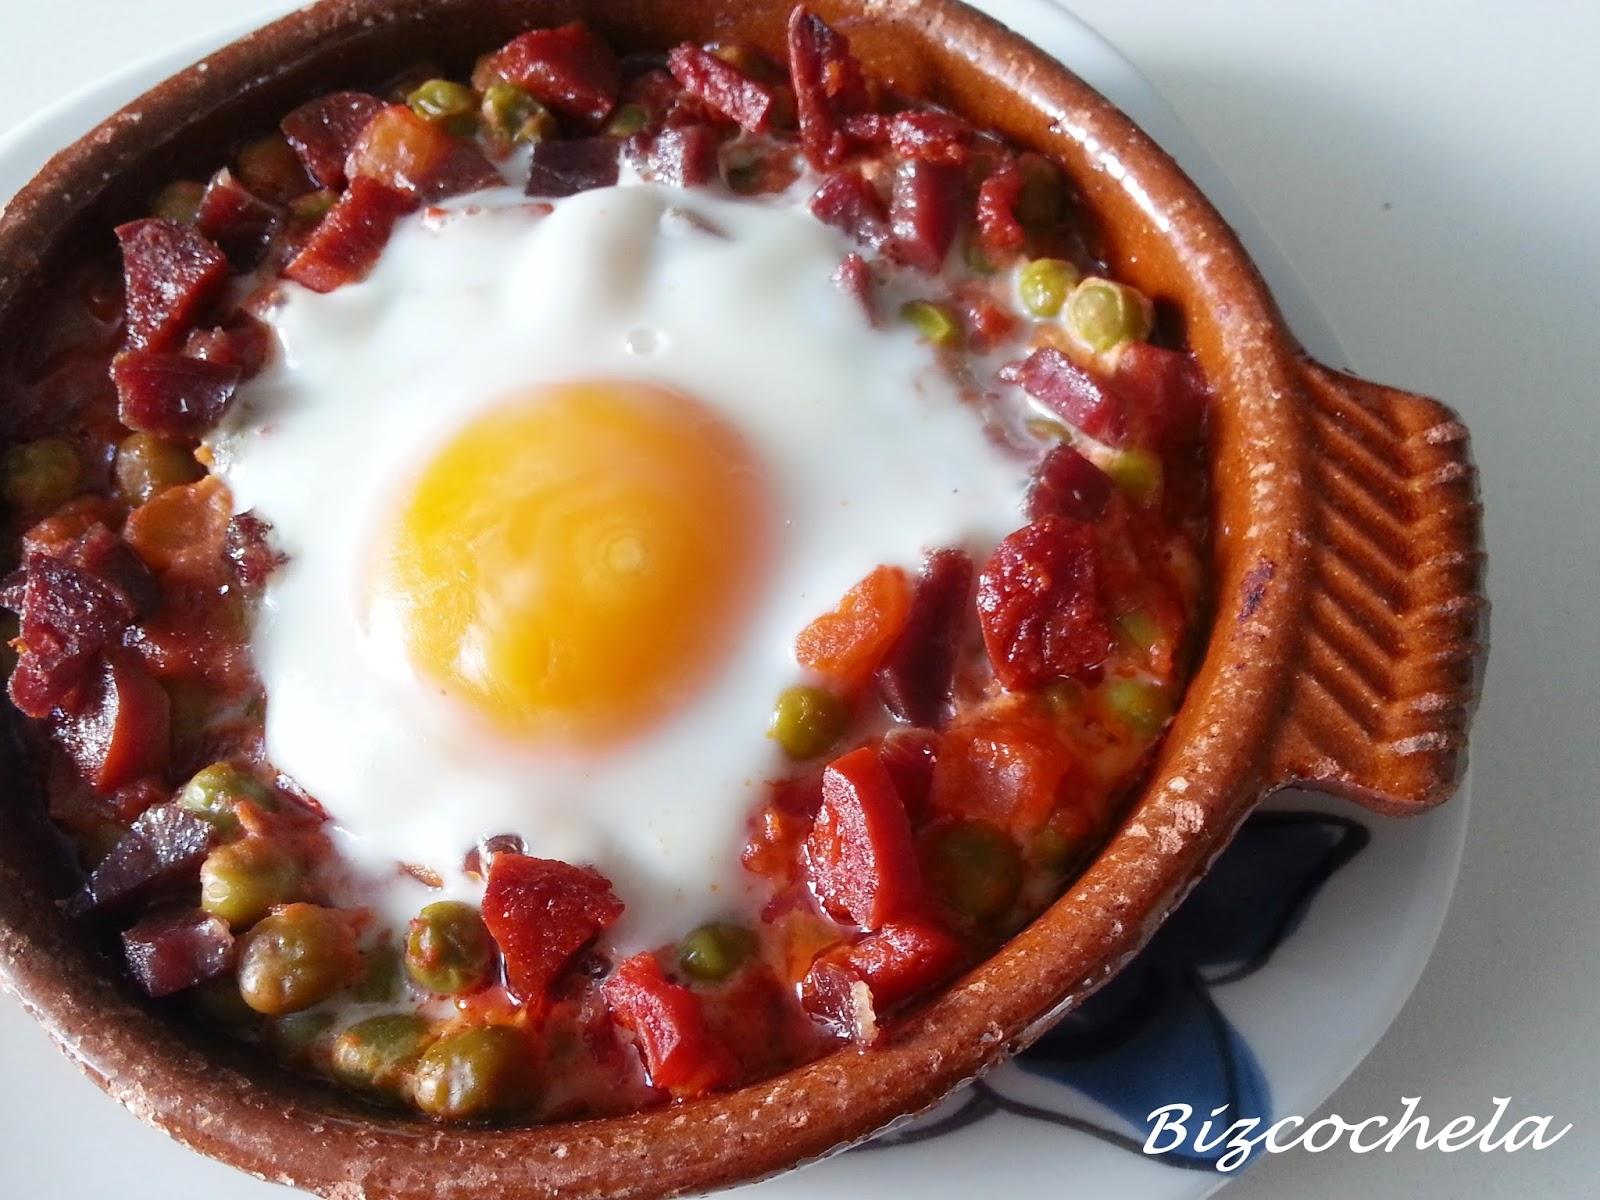 Related Keywords & Suggestions for huevos a la flamenca